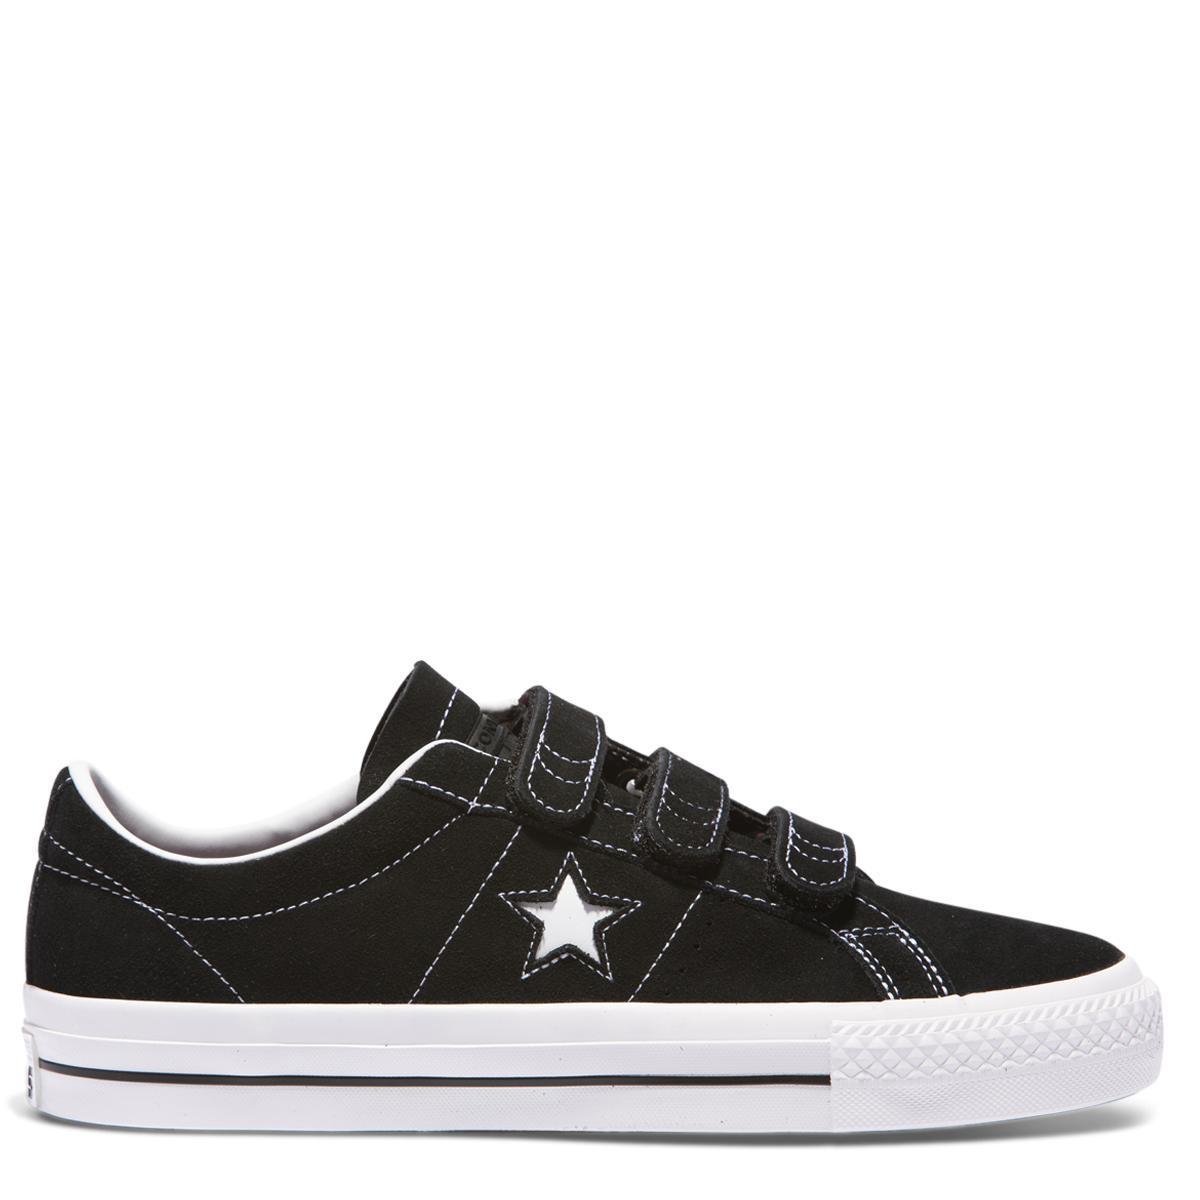 Jual Sepatu Sneakers Pria Terbaru Adidas Adh2912 Jam Tangan Unisex Hitam Converse One Star Pro 3v Ox